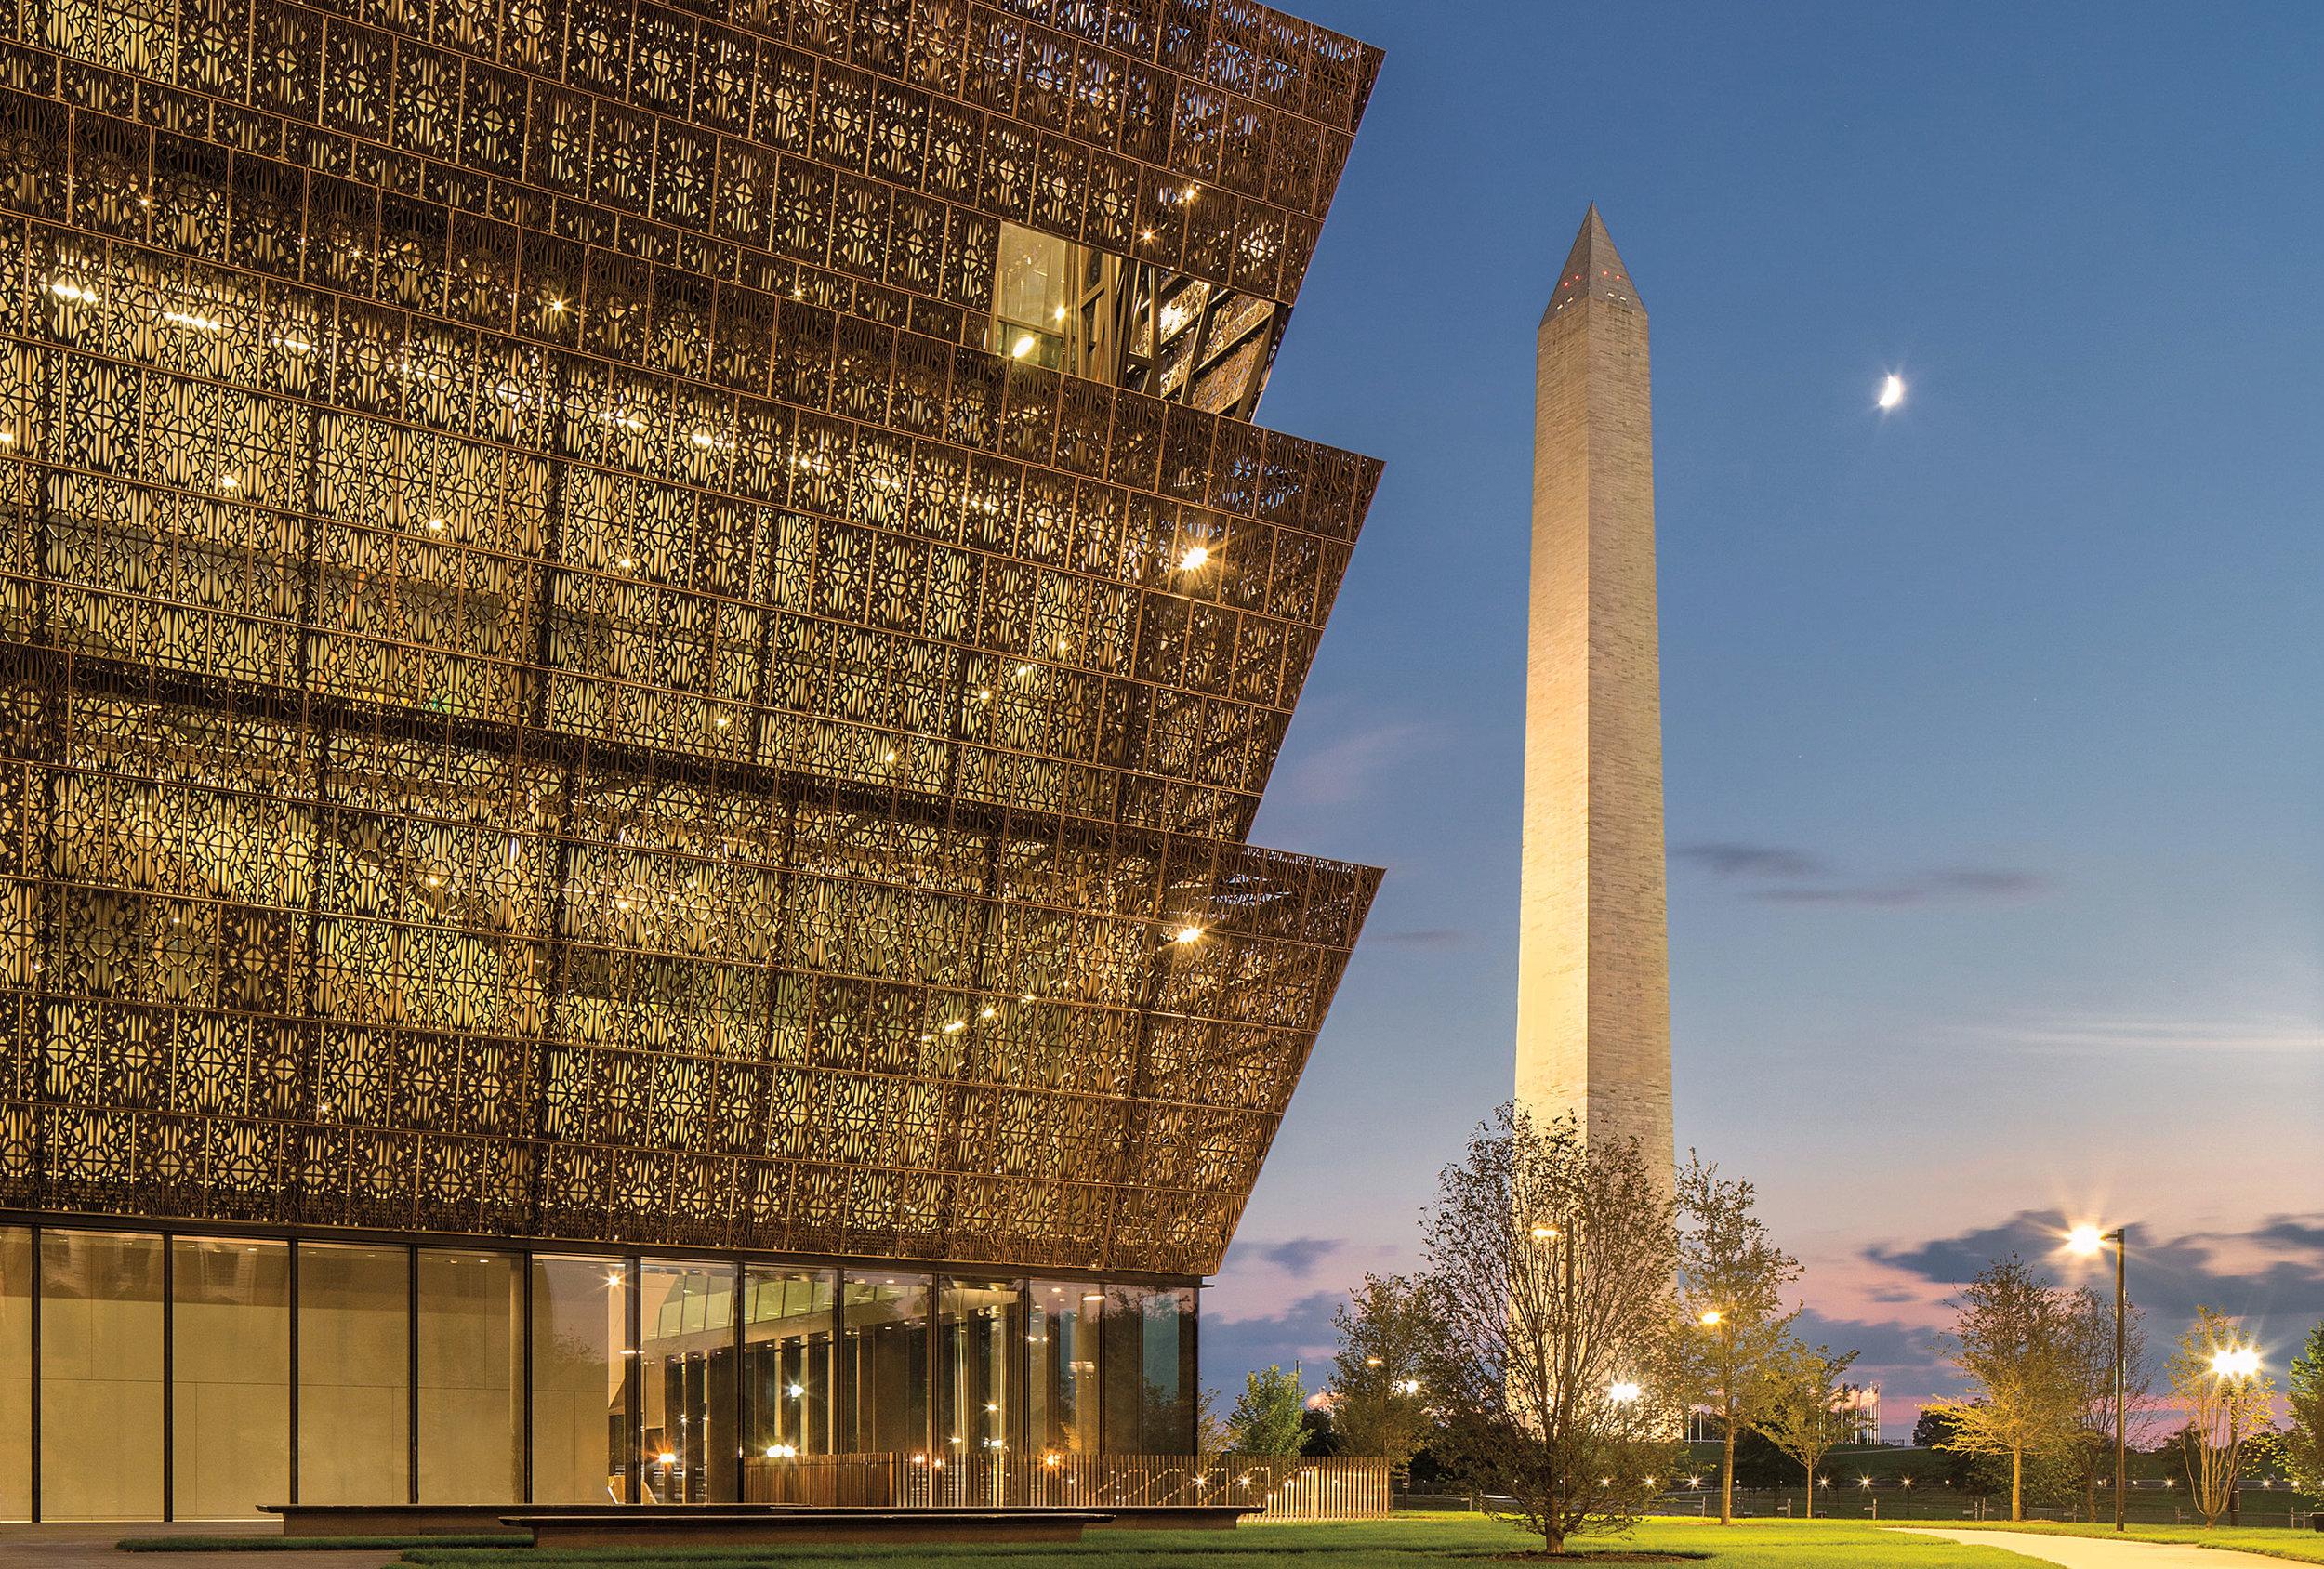 大卫·阿贾耶爵士设计的美国首都华盛顿的史密森尼国家博物馆(Smithsonian Institute National Museum of African American History and Culture)。